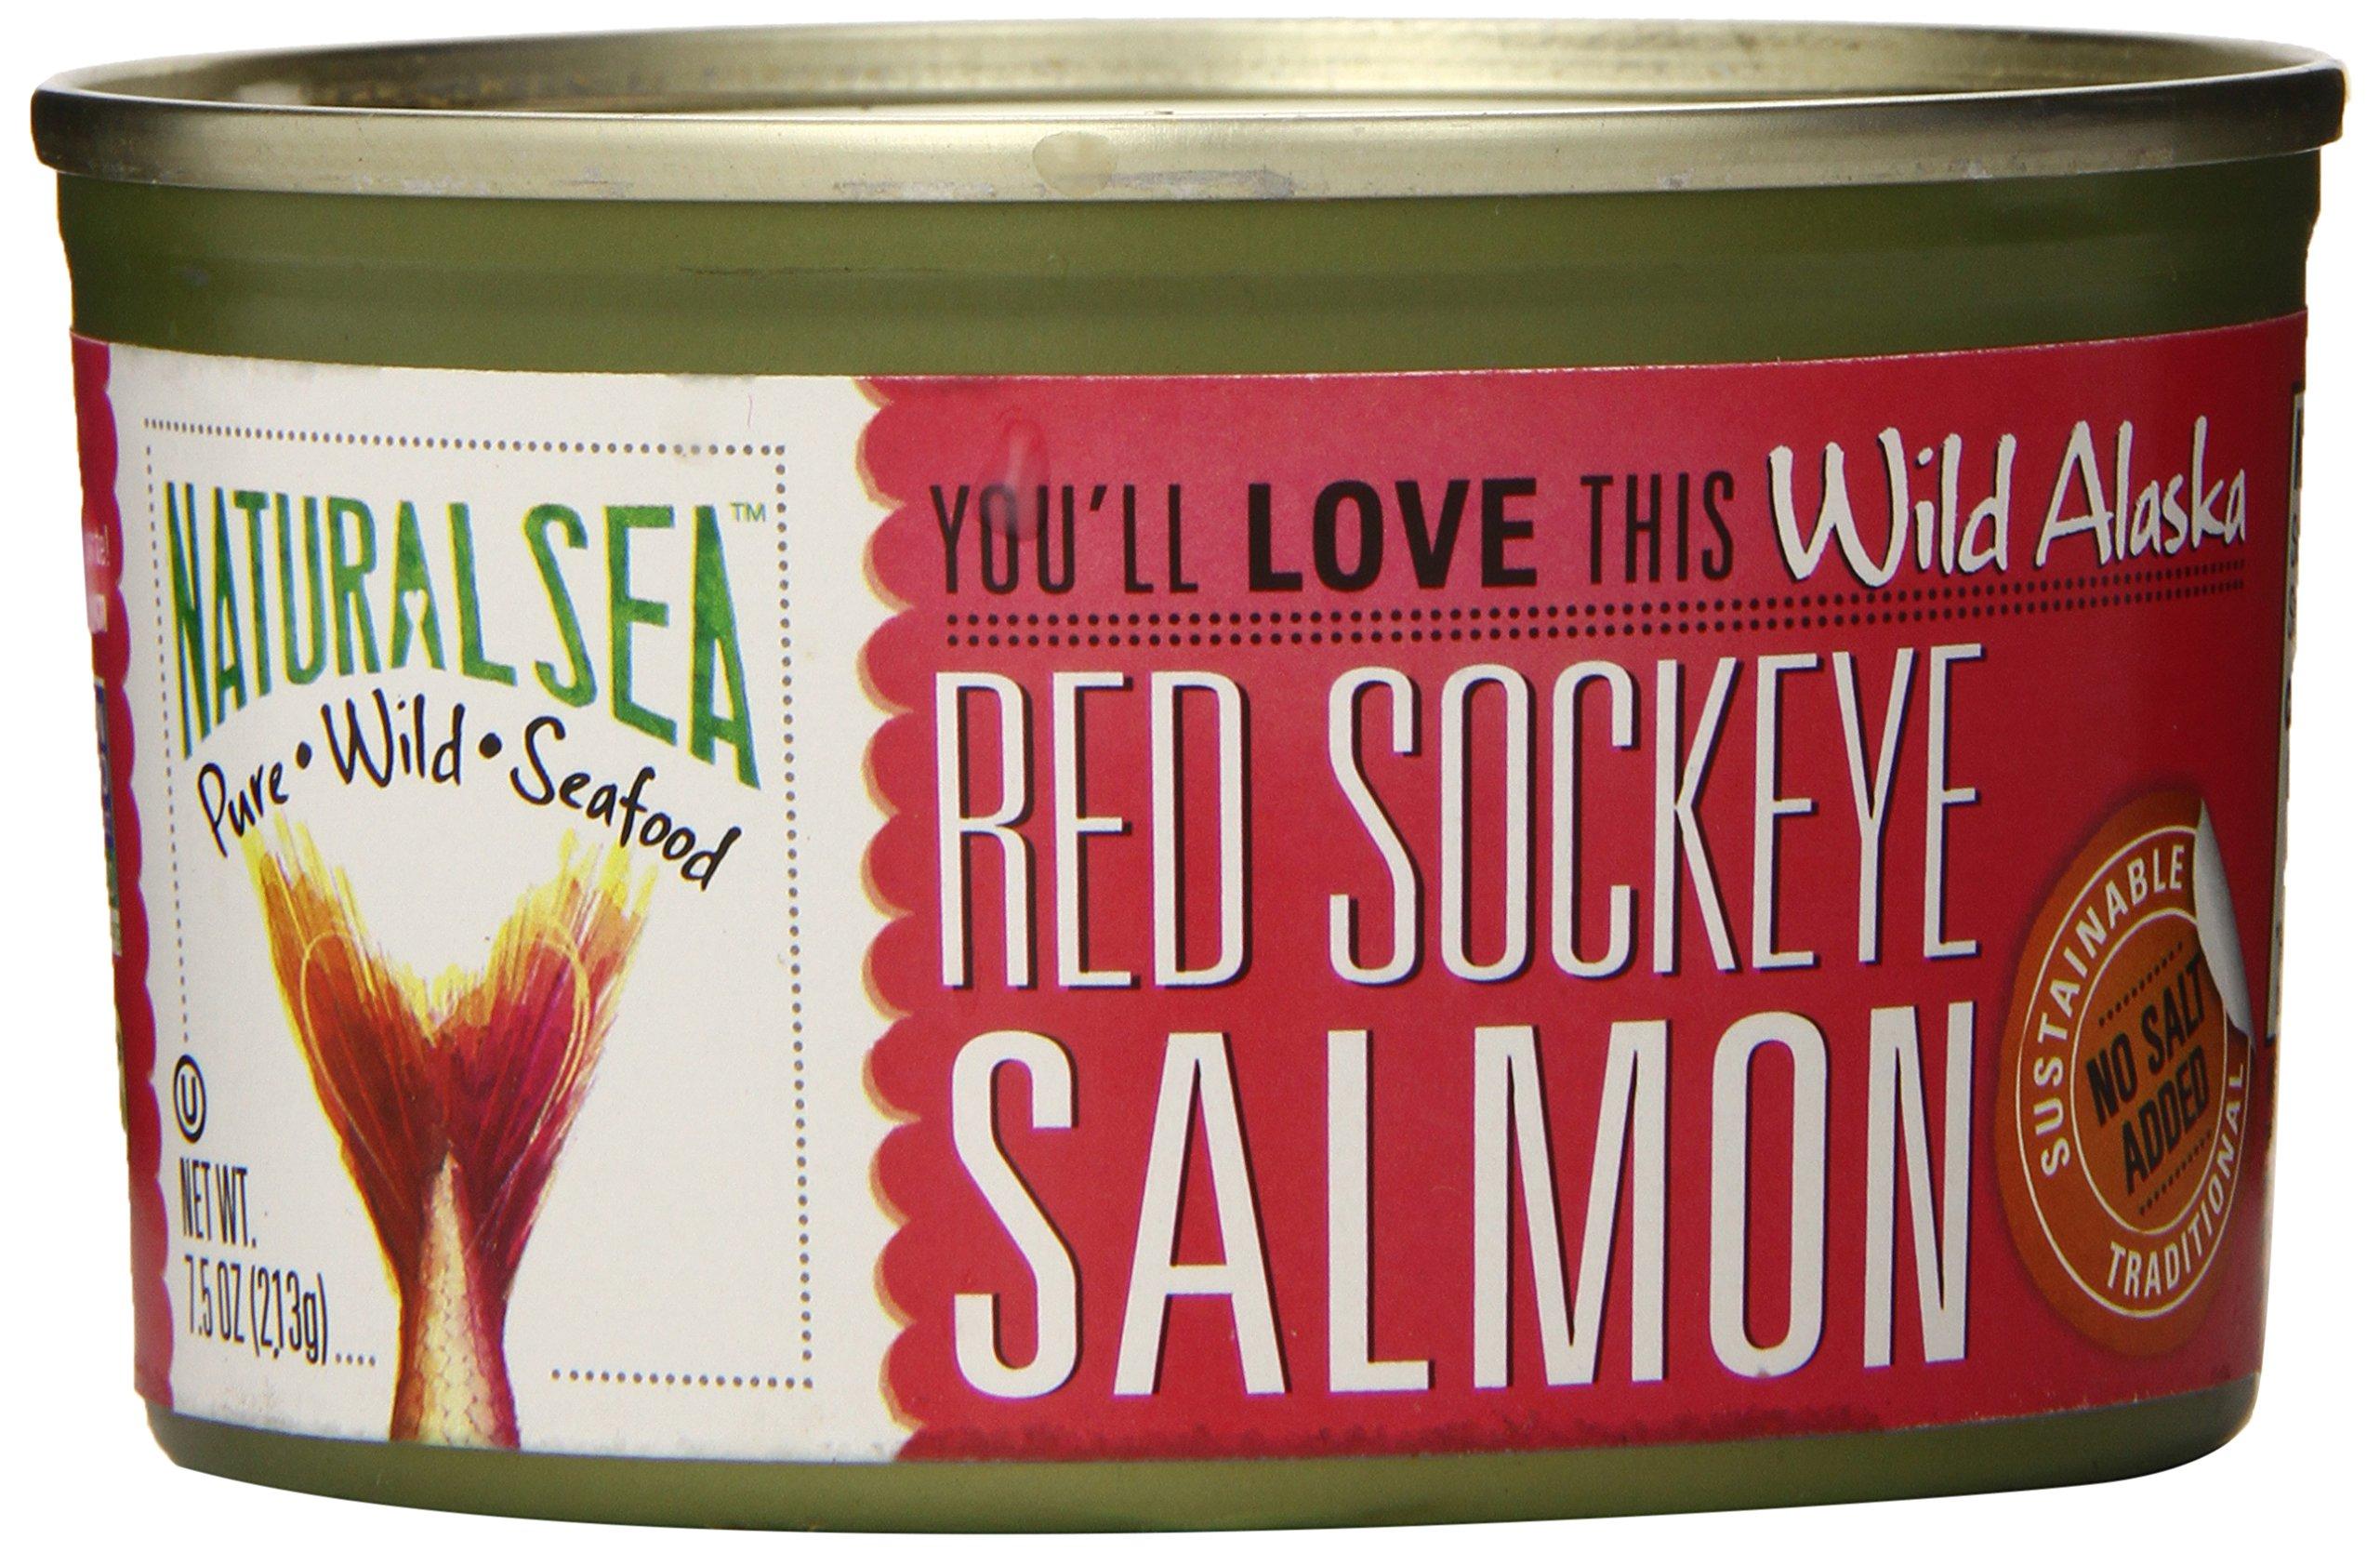 Natural Sea Wild Alaskan Red Sockeye Salmon, No Salt Added, 7.50-Ounce